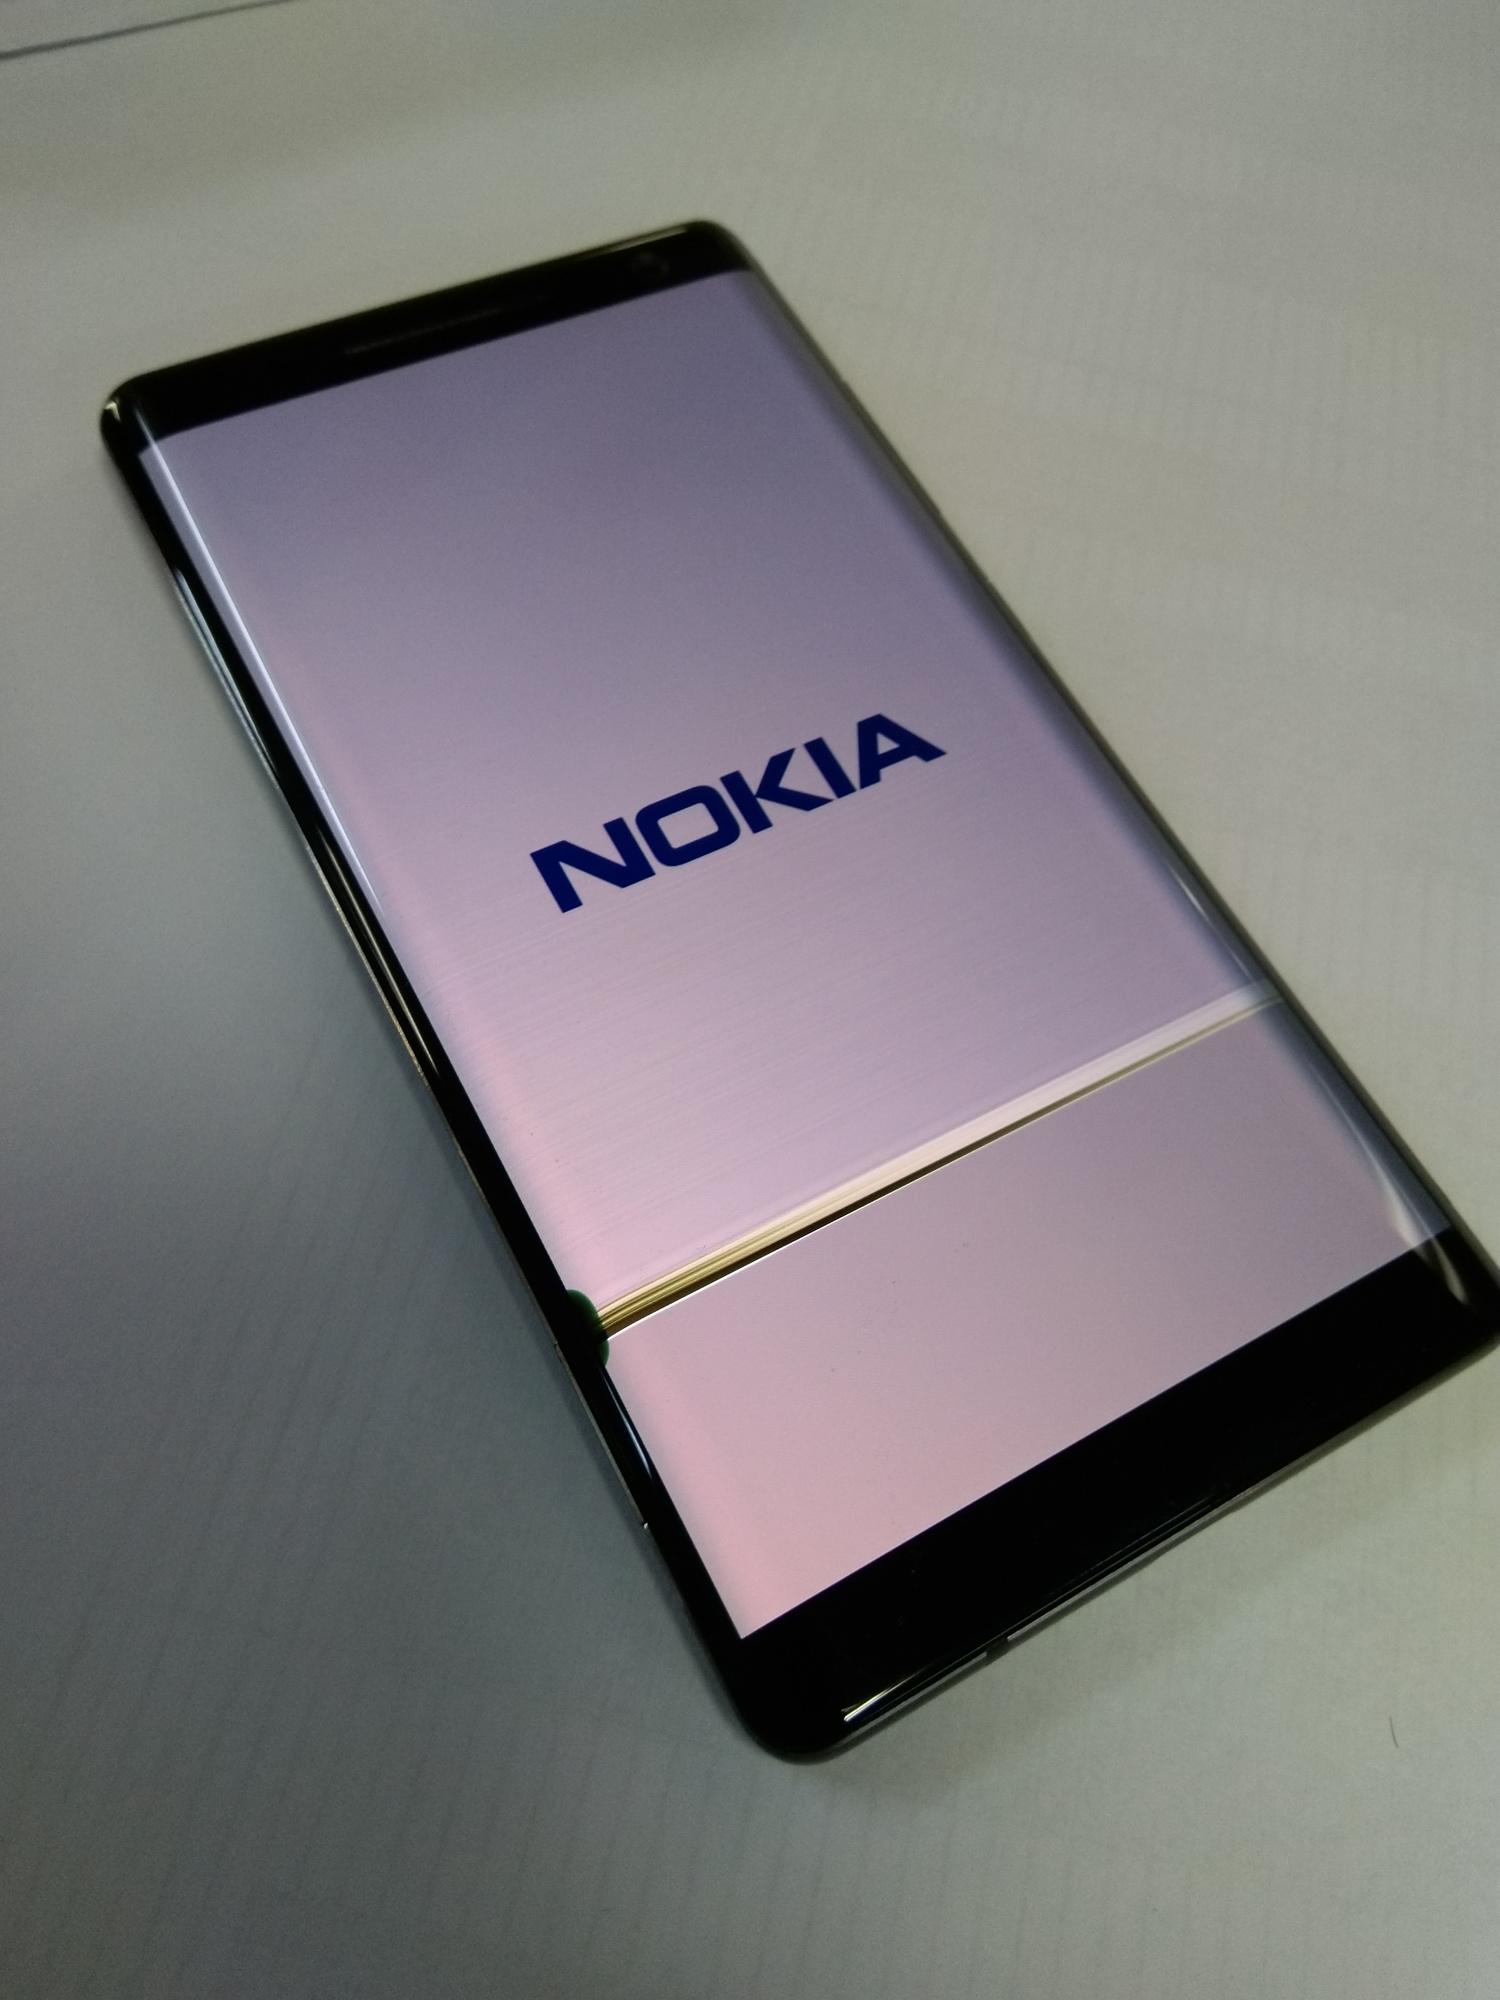 Nokia04.jpg